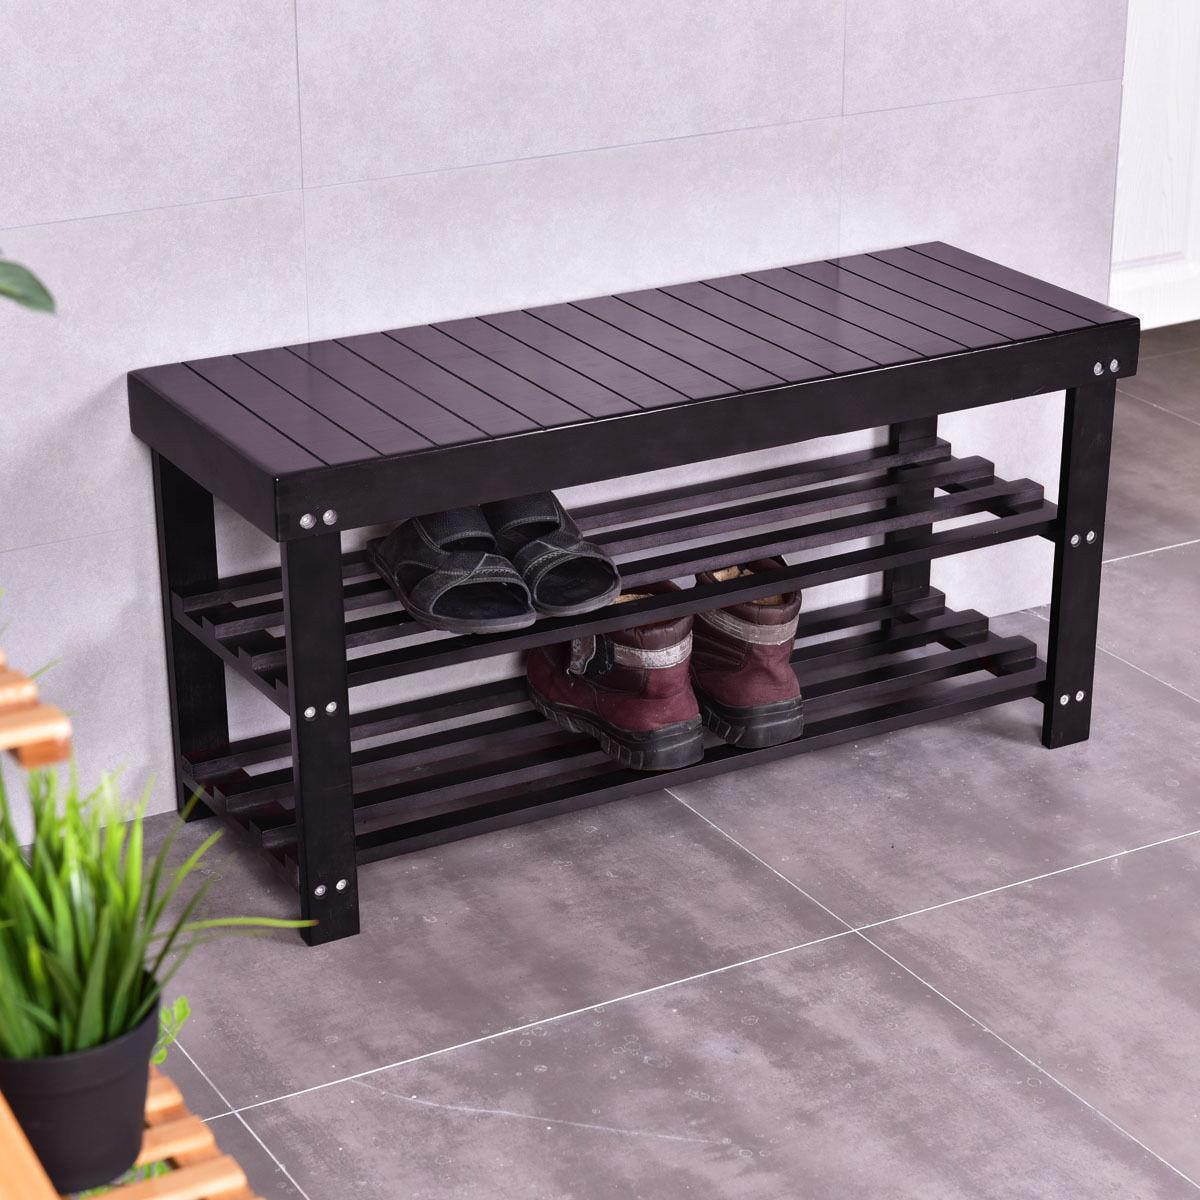 "Ktaxon 36"" Solid Wood Shoe Bench 3 Tier Storage Racks Seat"